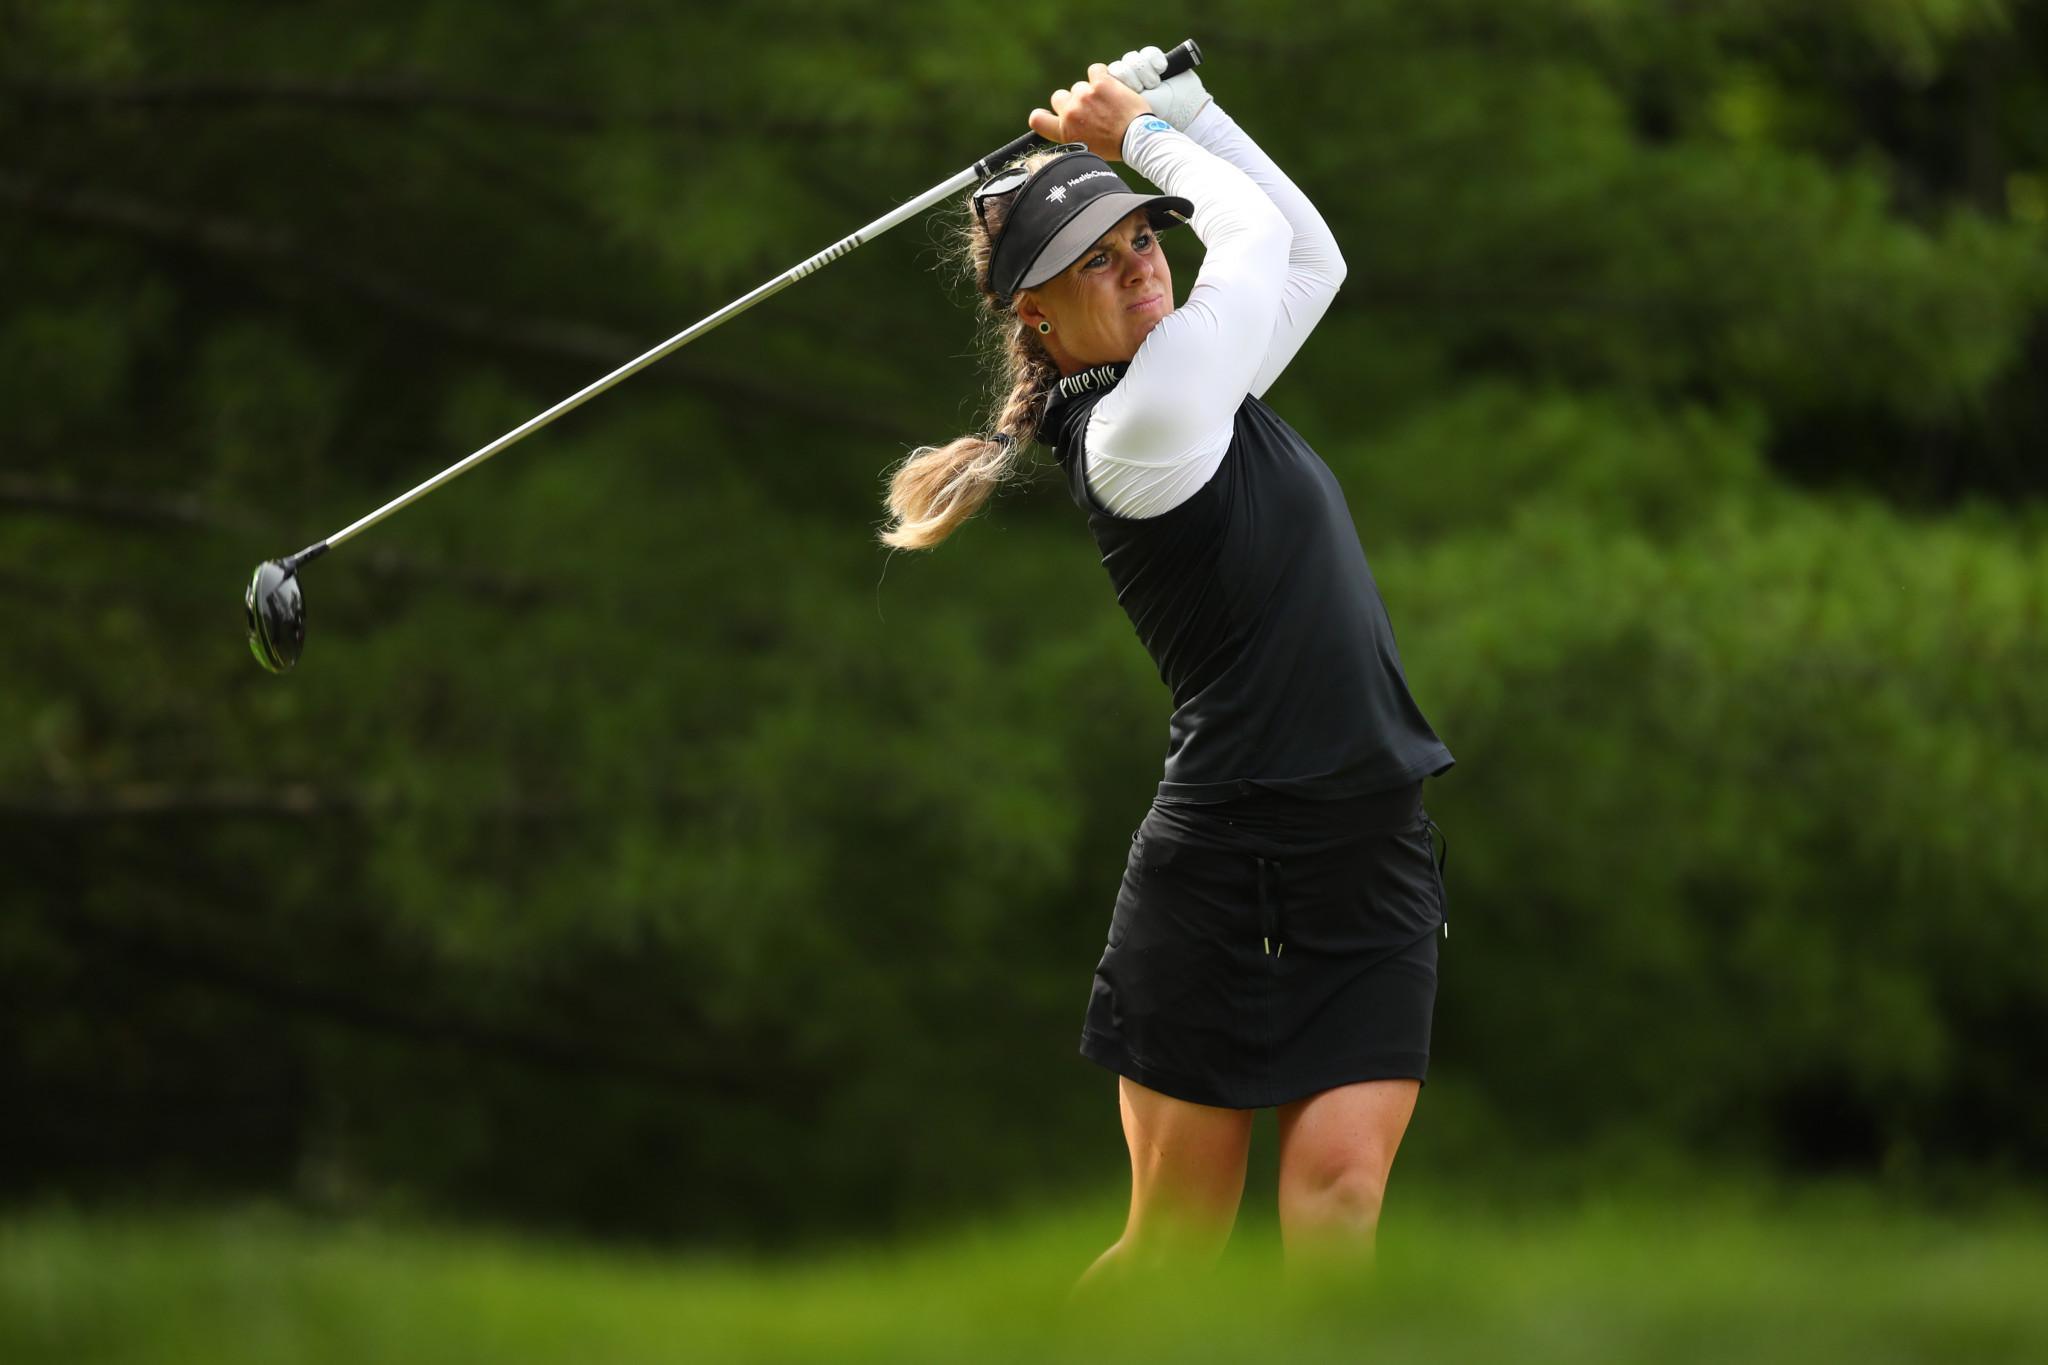 Holmqvist earns one shot lead at Women's British Open